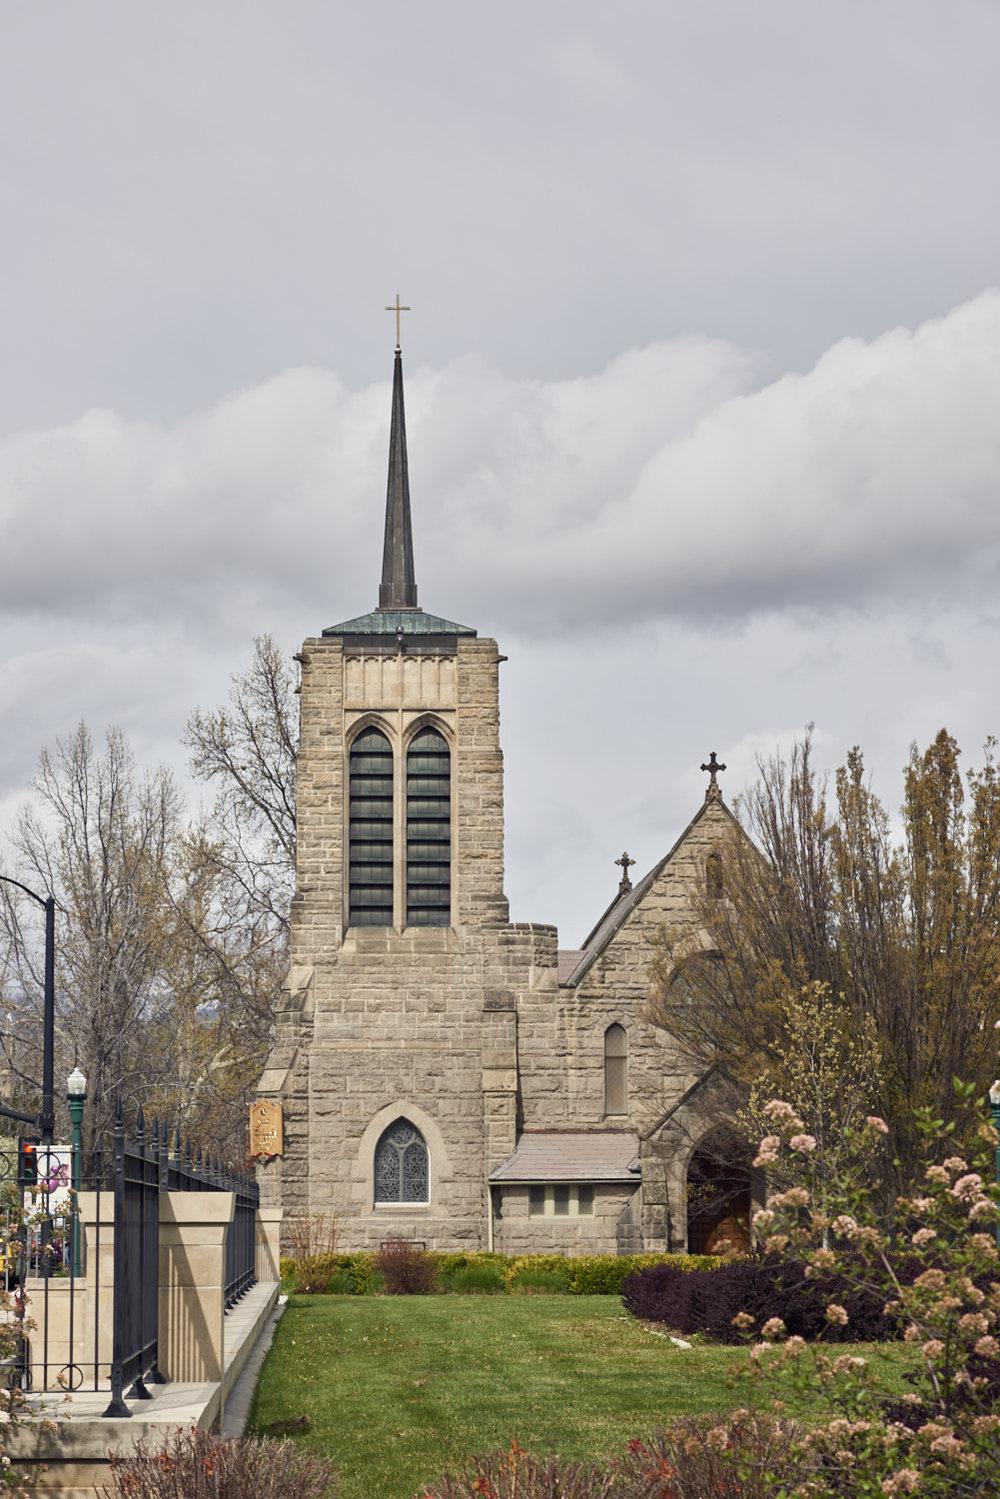 St. Michael's Church, Boise, ID. (c) 2017 - Steven Starr